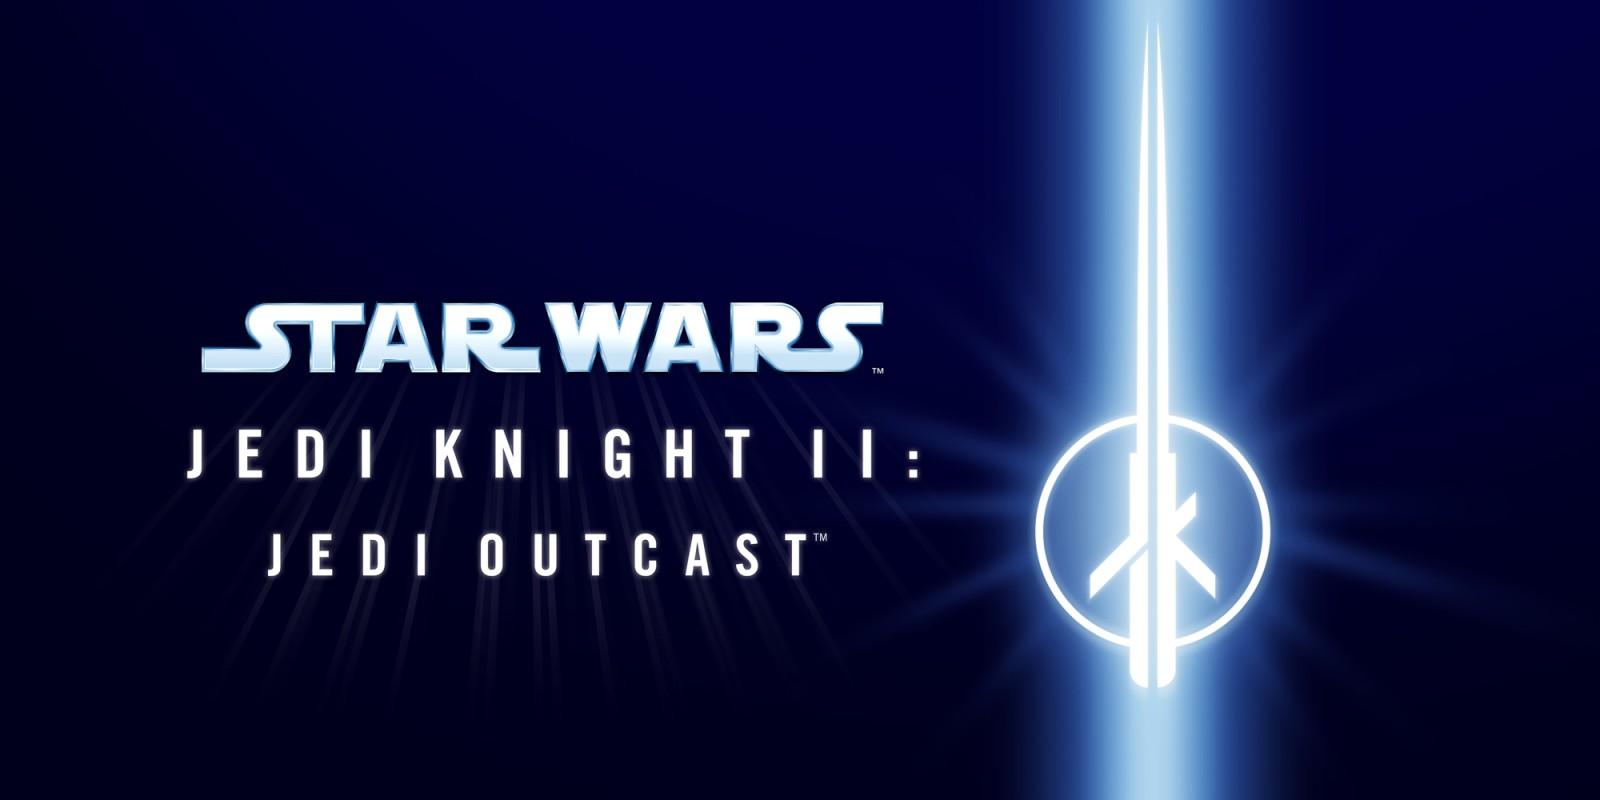 Star Wars Jedi Knight II - Jedi Outcast action pc game 2002